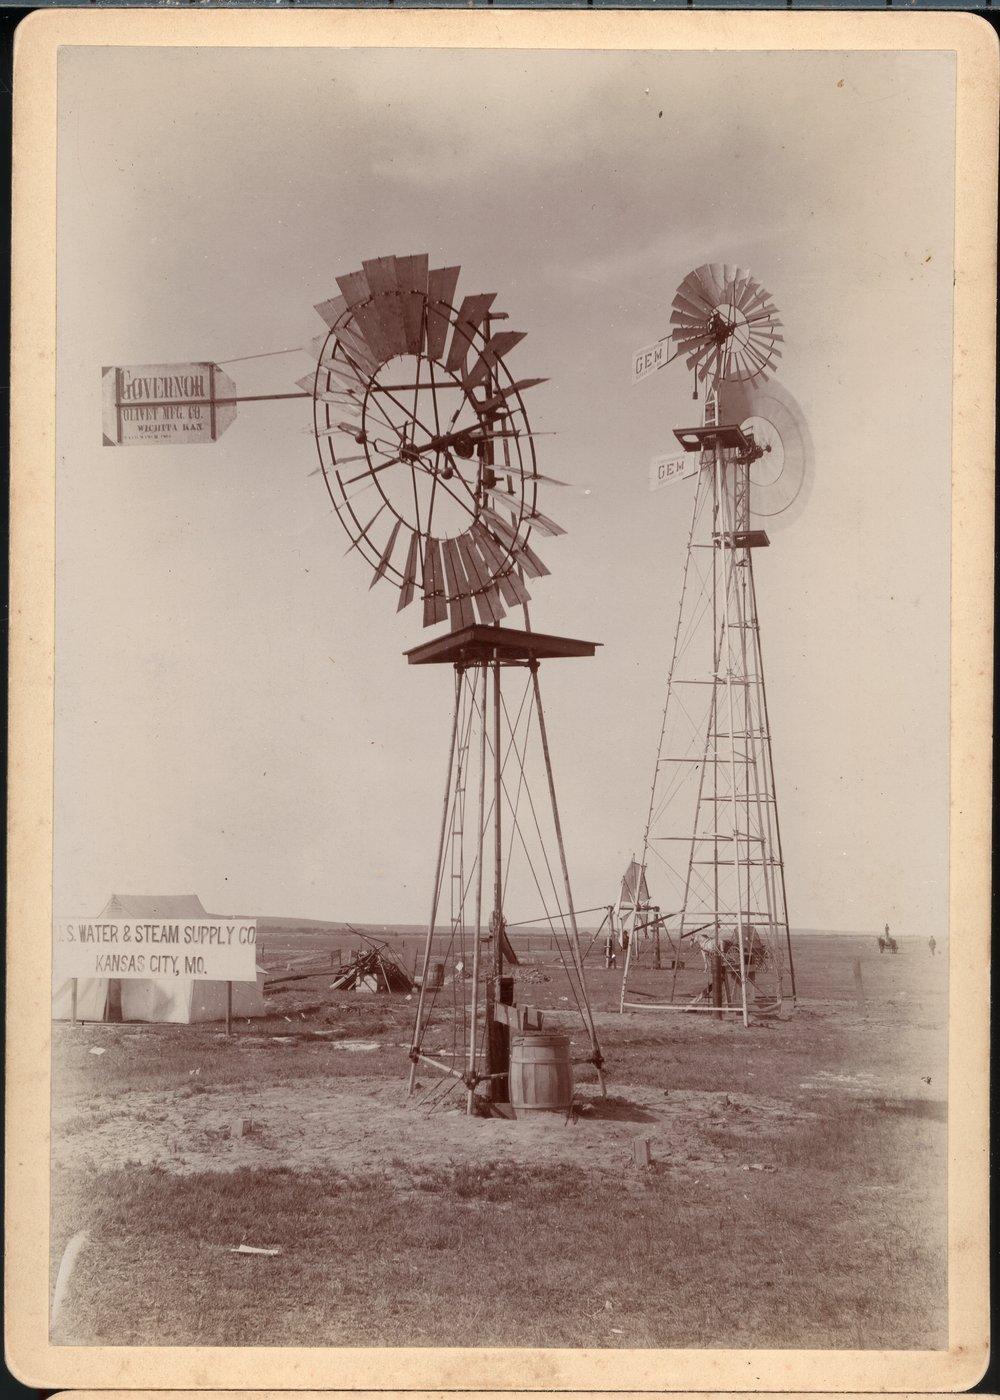 Irrigation and windmills in Kansas - 1